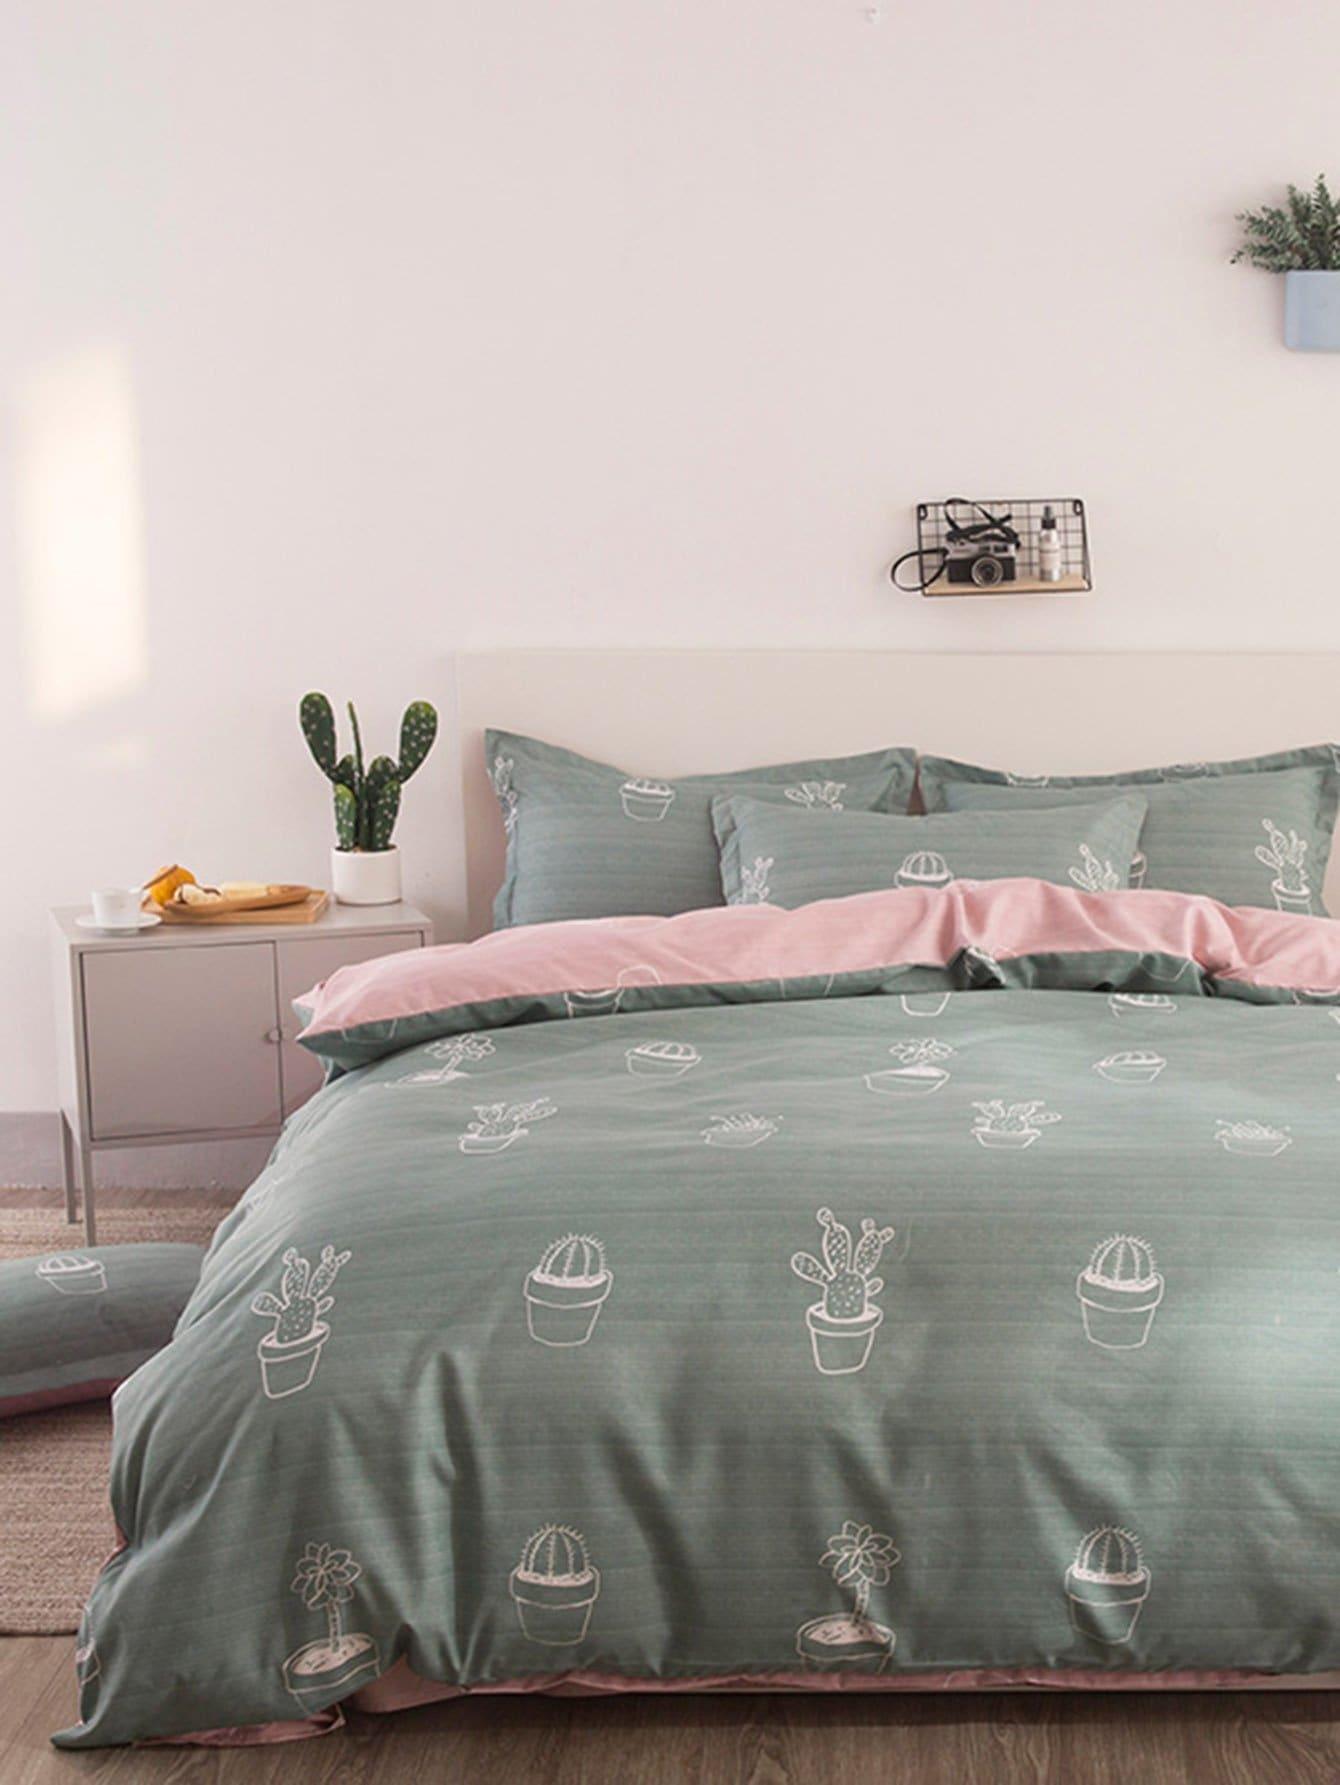 Cactus Print Bedding Set heart print bedding set